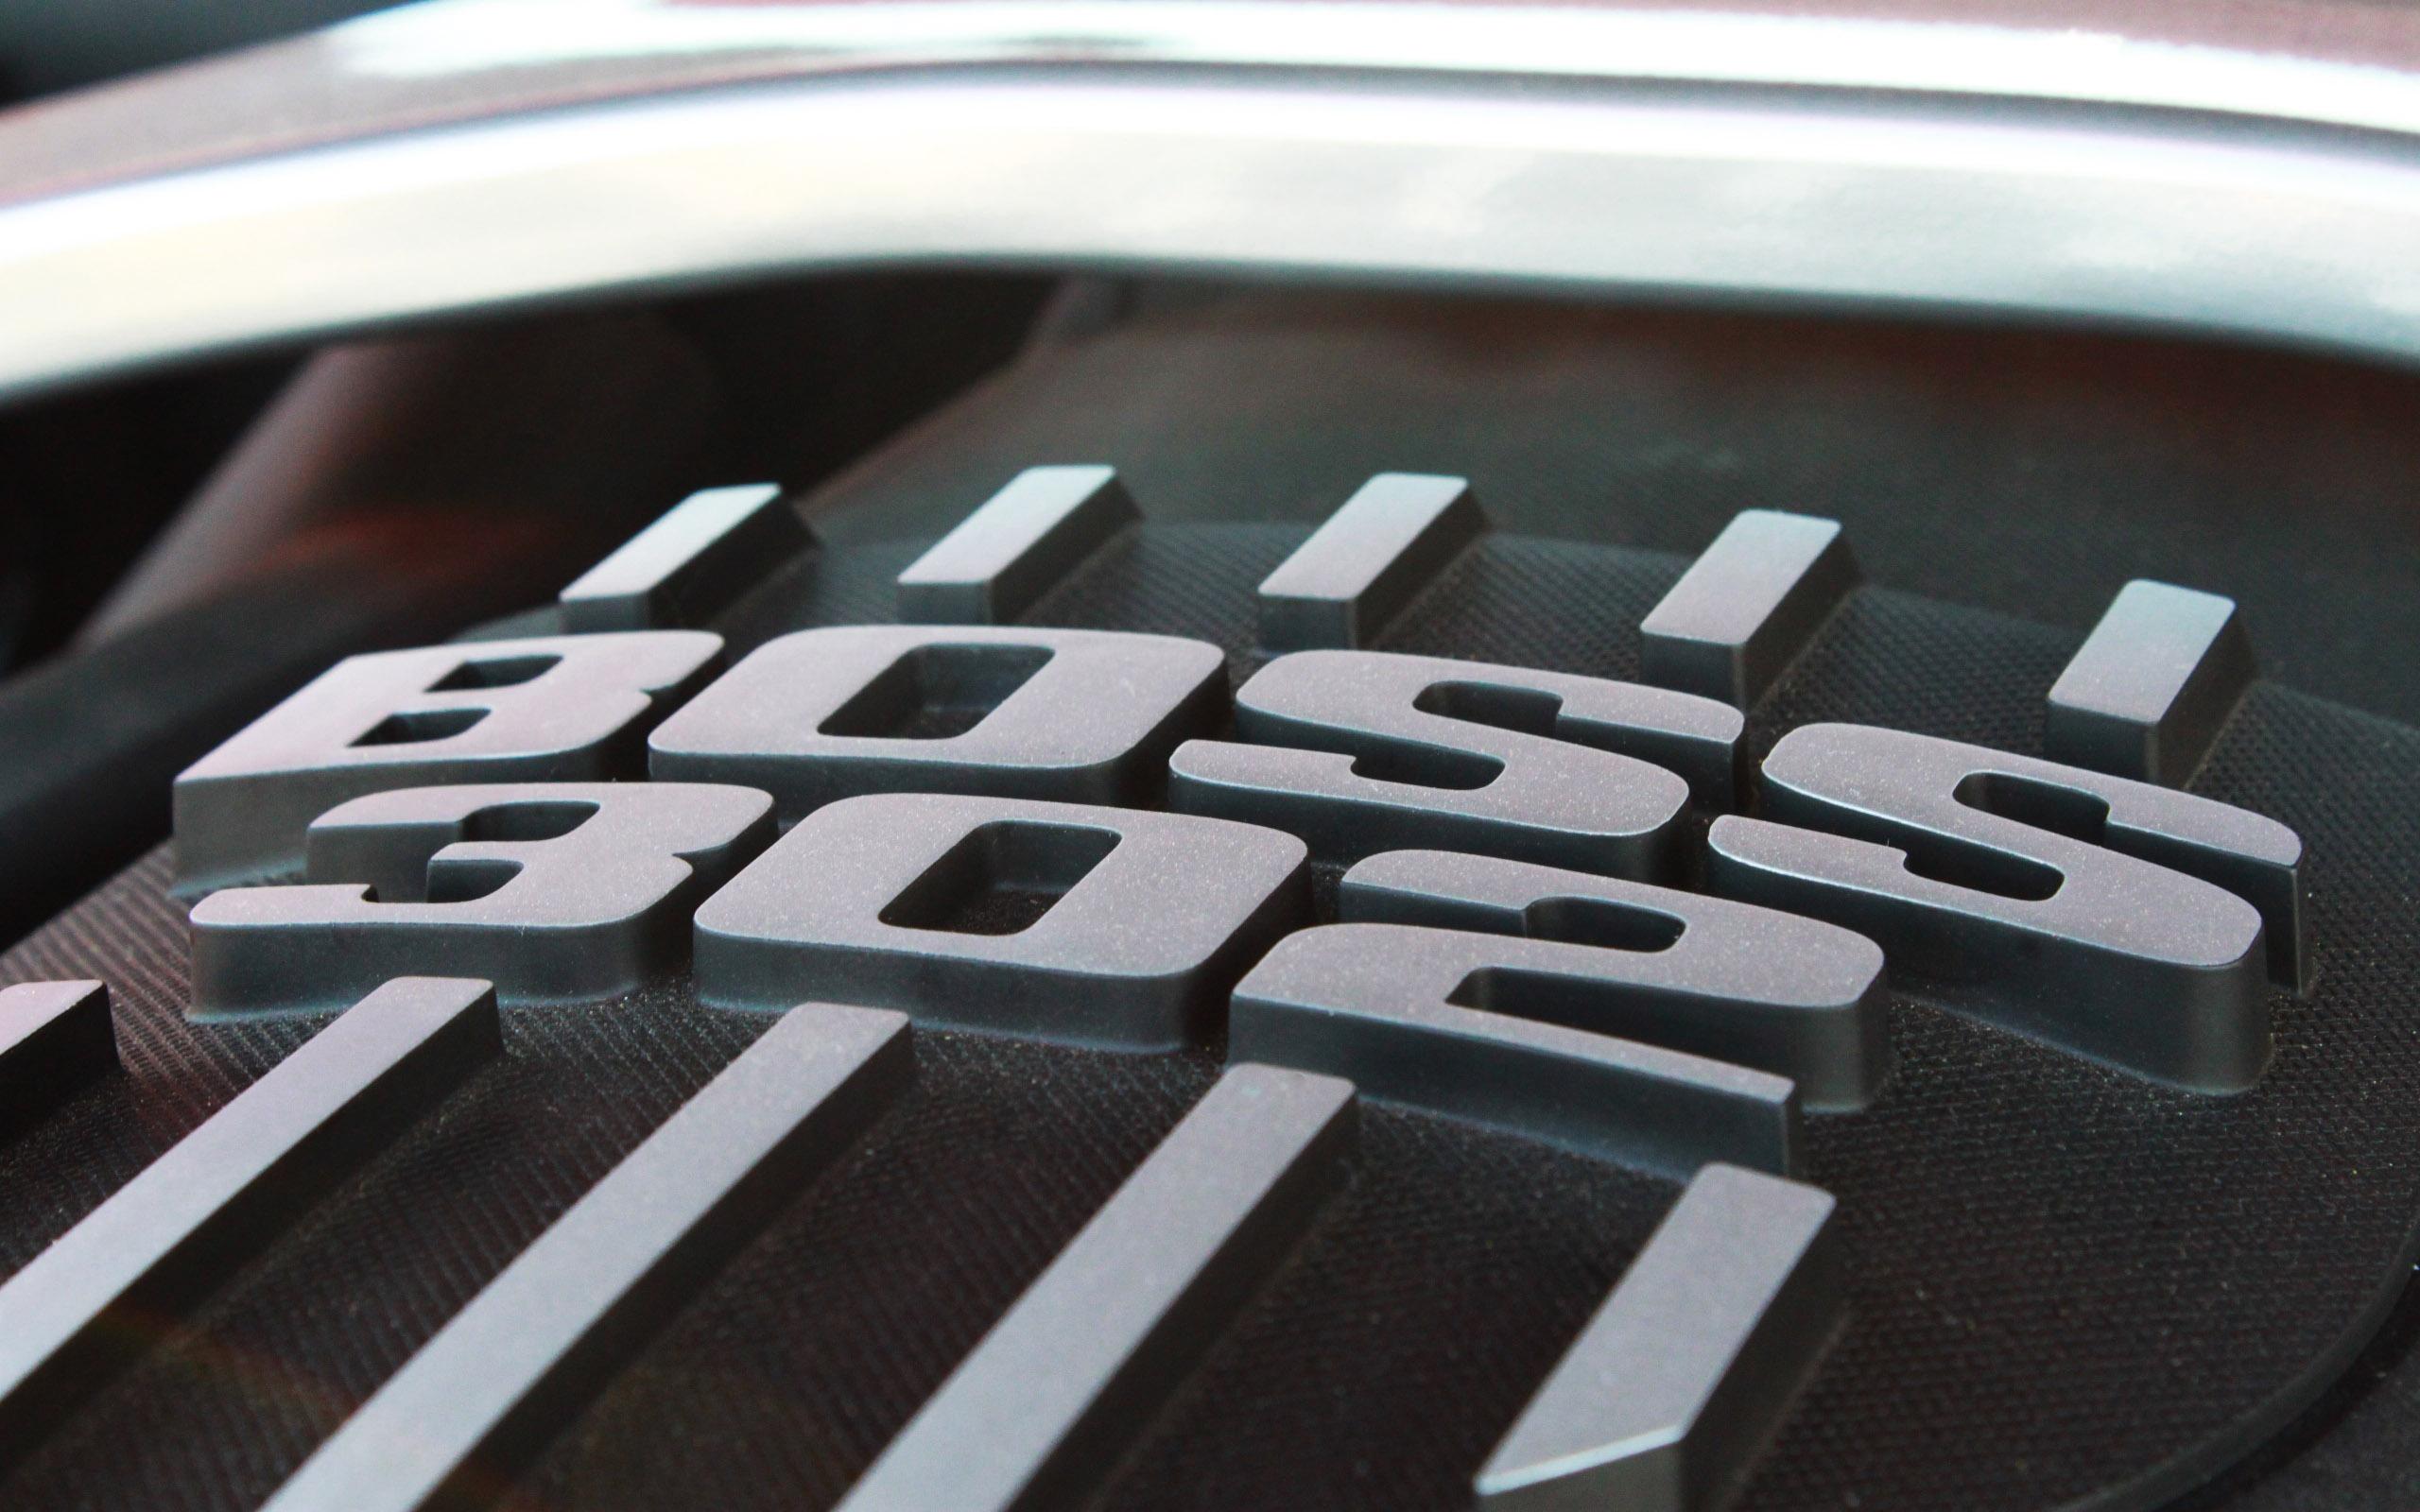 Ford Emblem Wallpaper 2560x1600 Ford Emblem Ford Mustang Boss 302 2560x1600